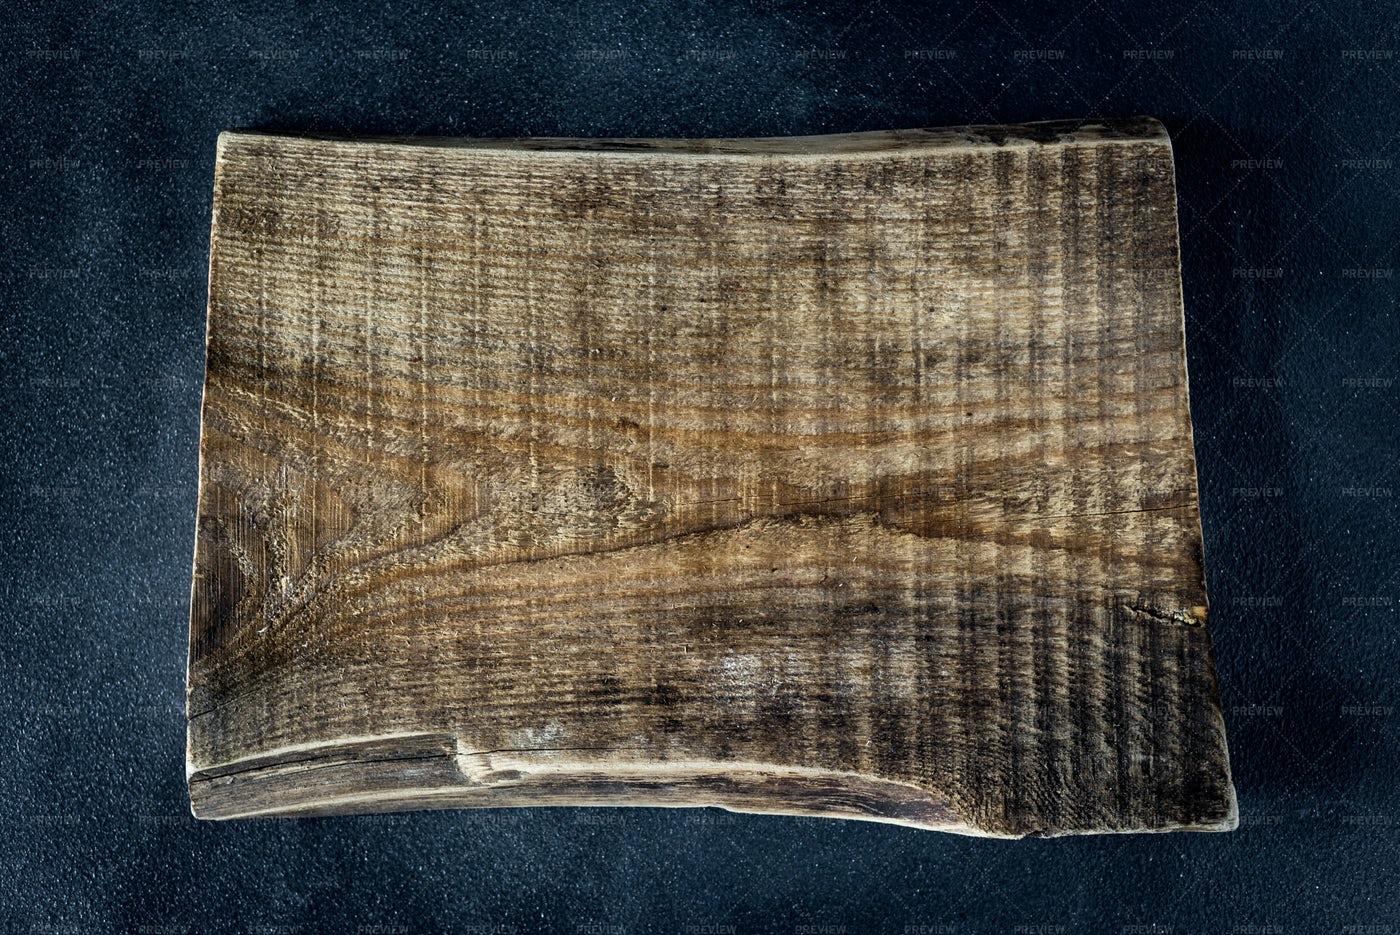 Vintage Chunk Of Wood: Stock Photos